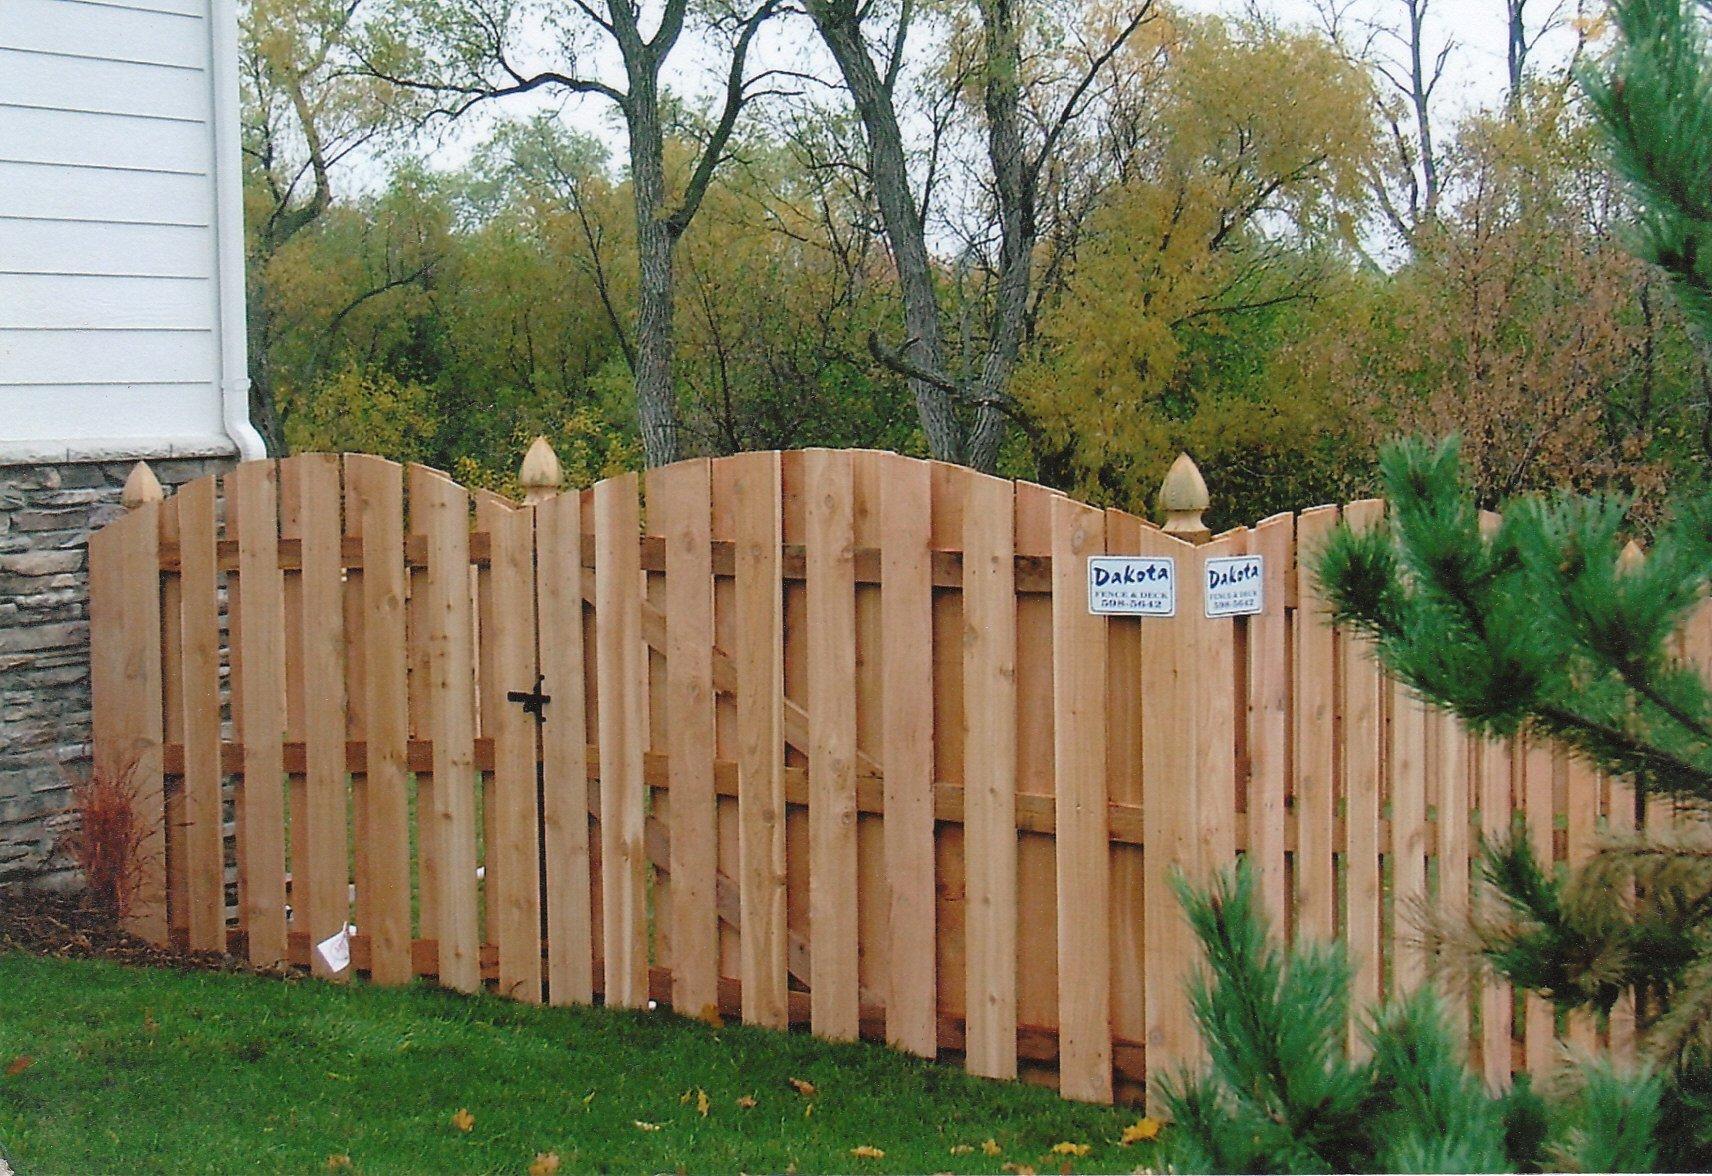 Dakota Fence & Deck 6' cedar board on board fence scalloped up with gothic posts - Omaha and Papillion, Nebraska